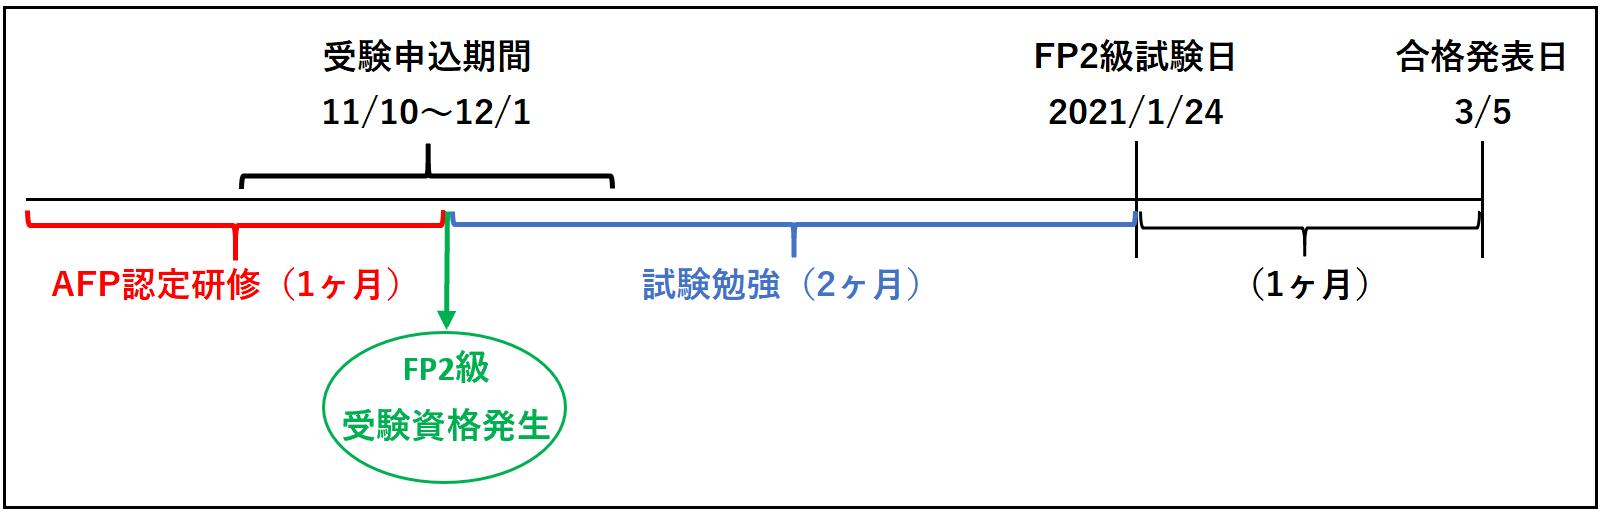 FP2級受験資格(AFP認定研修ルート)